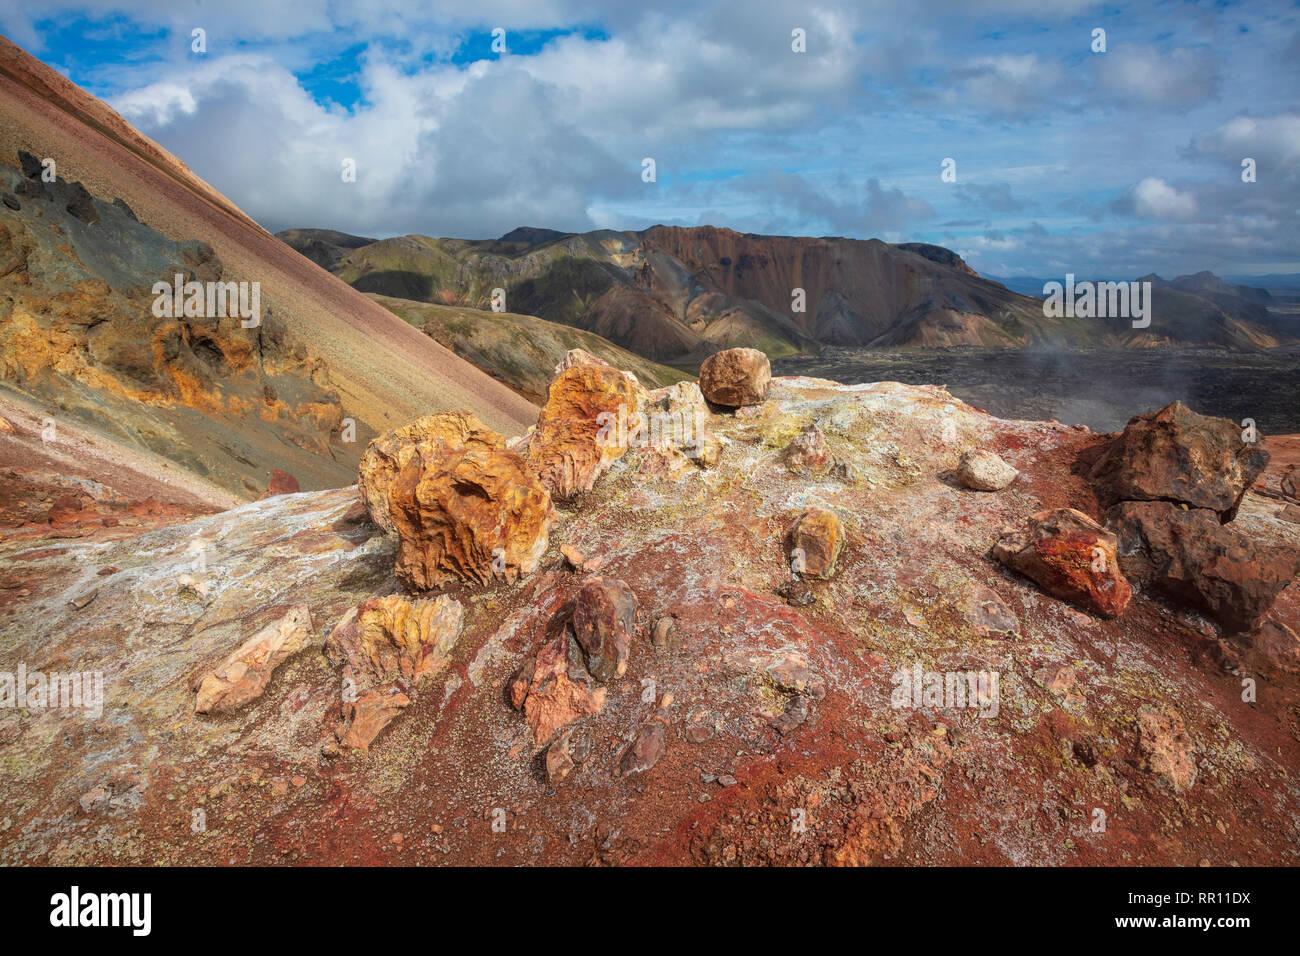 Volcanic mineral deposits along the Laugavegur trail near Landmannalaugar. Central Highlands, Sudhurland, Iceland. - Stock Image